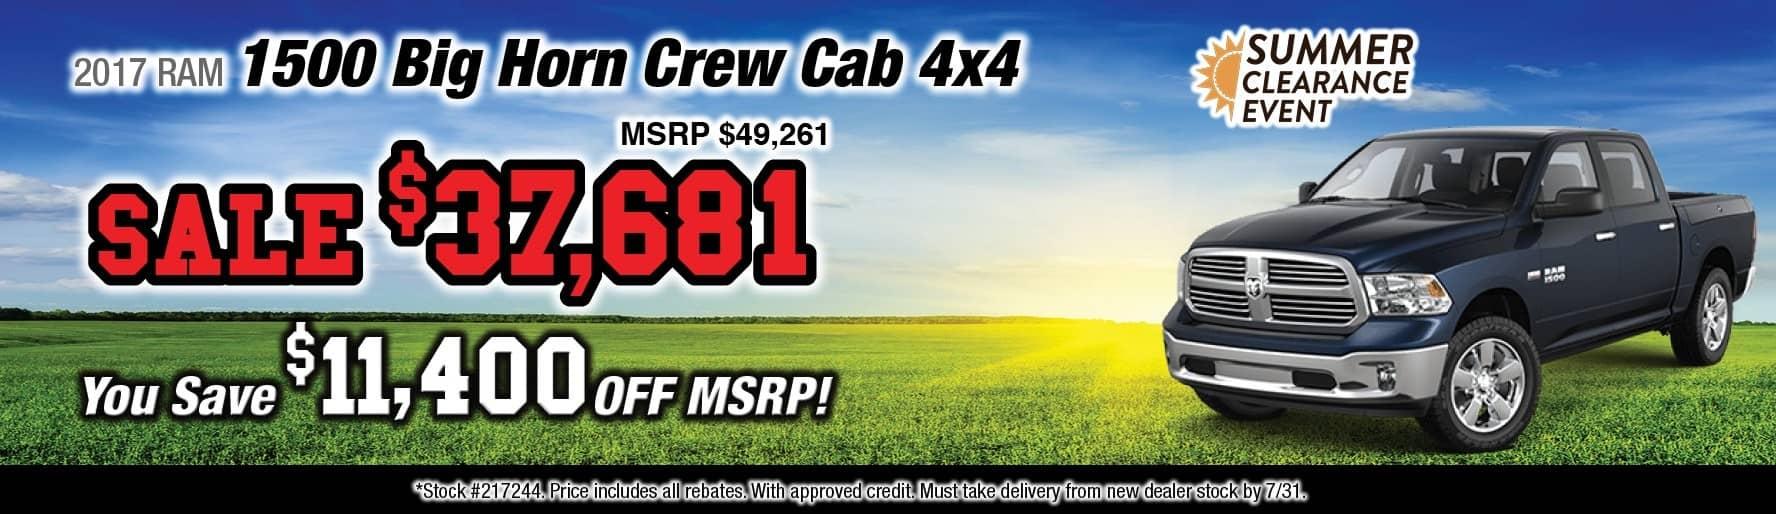 2017 RAM 1500 Big Horn Crew Cab 4x4